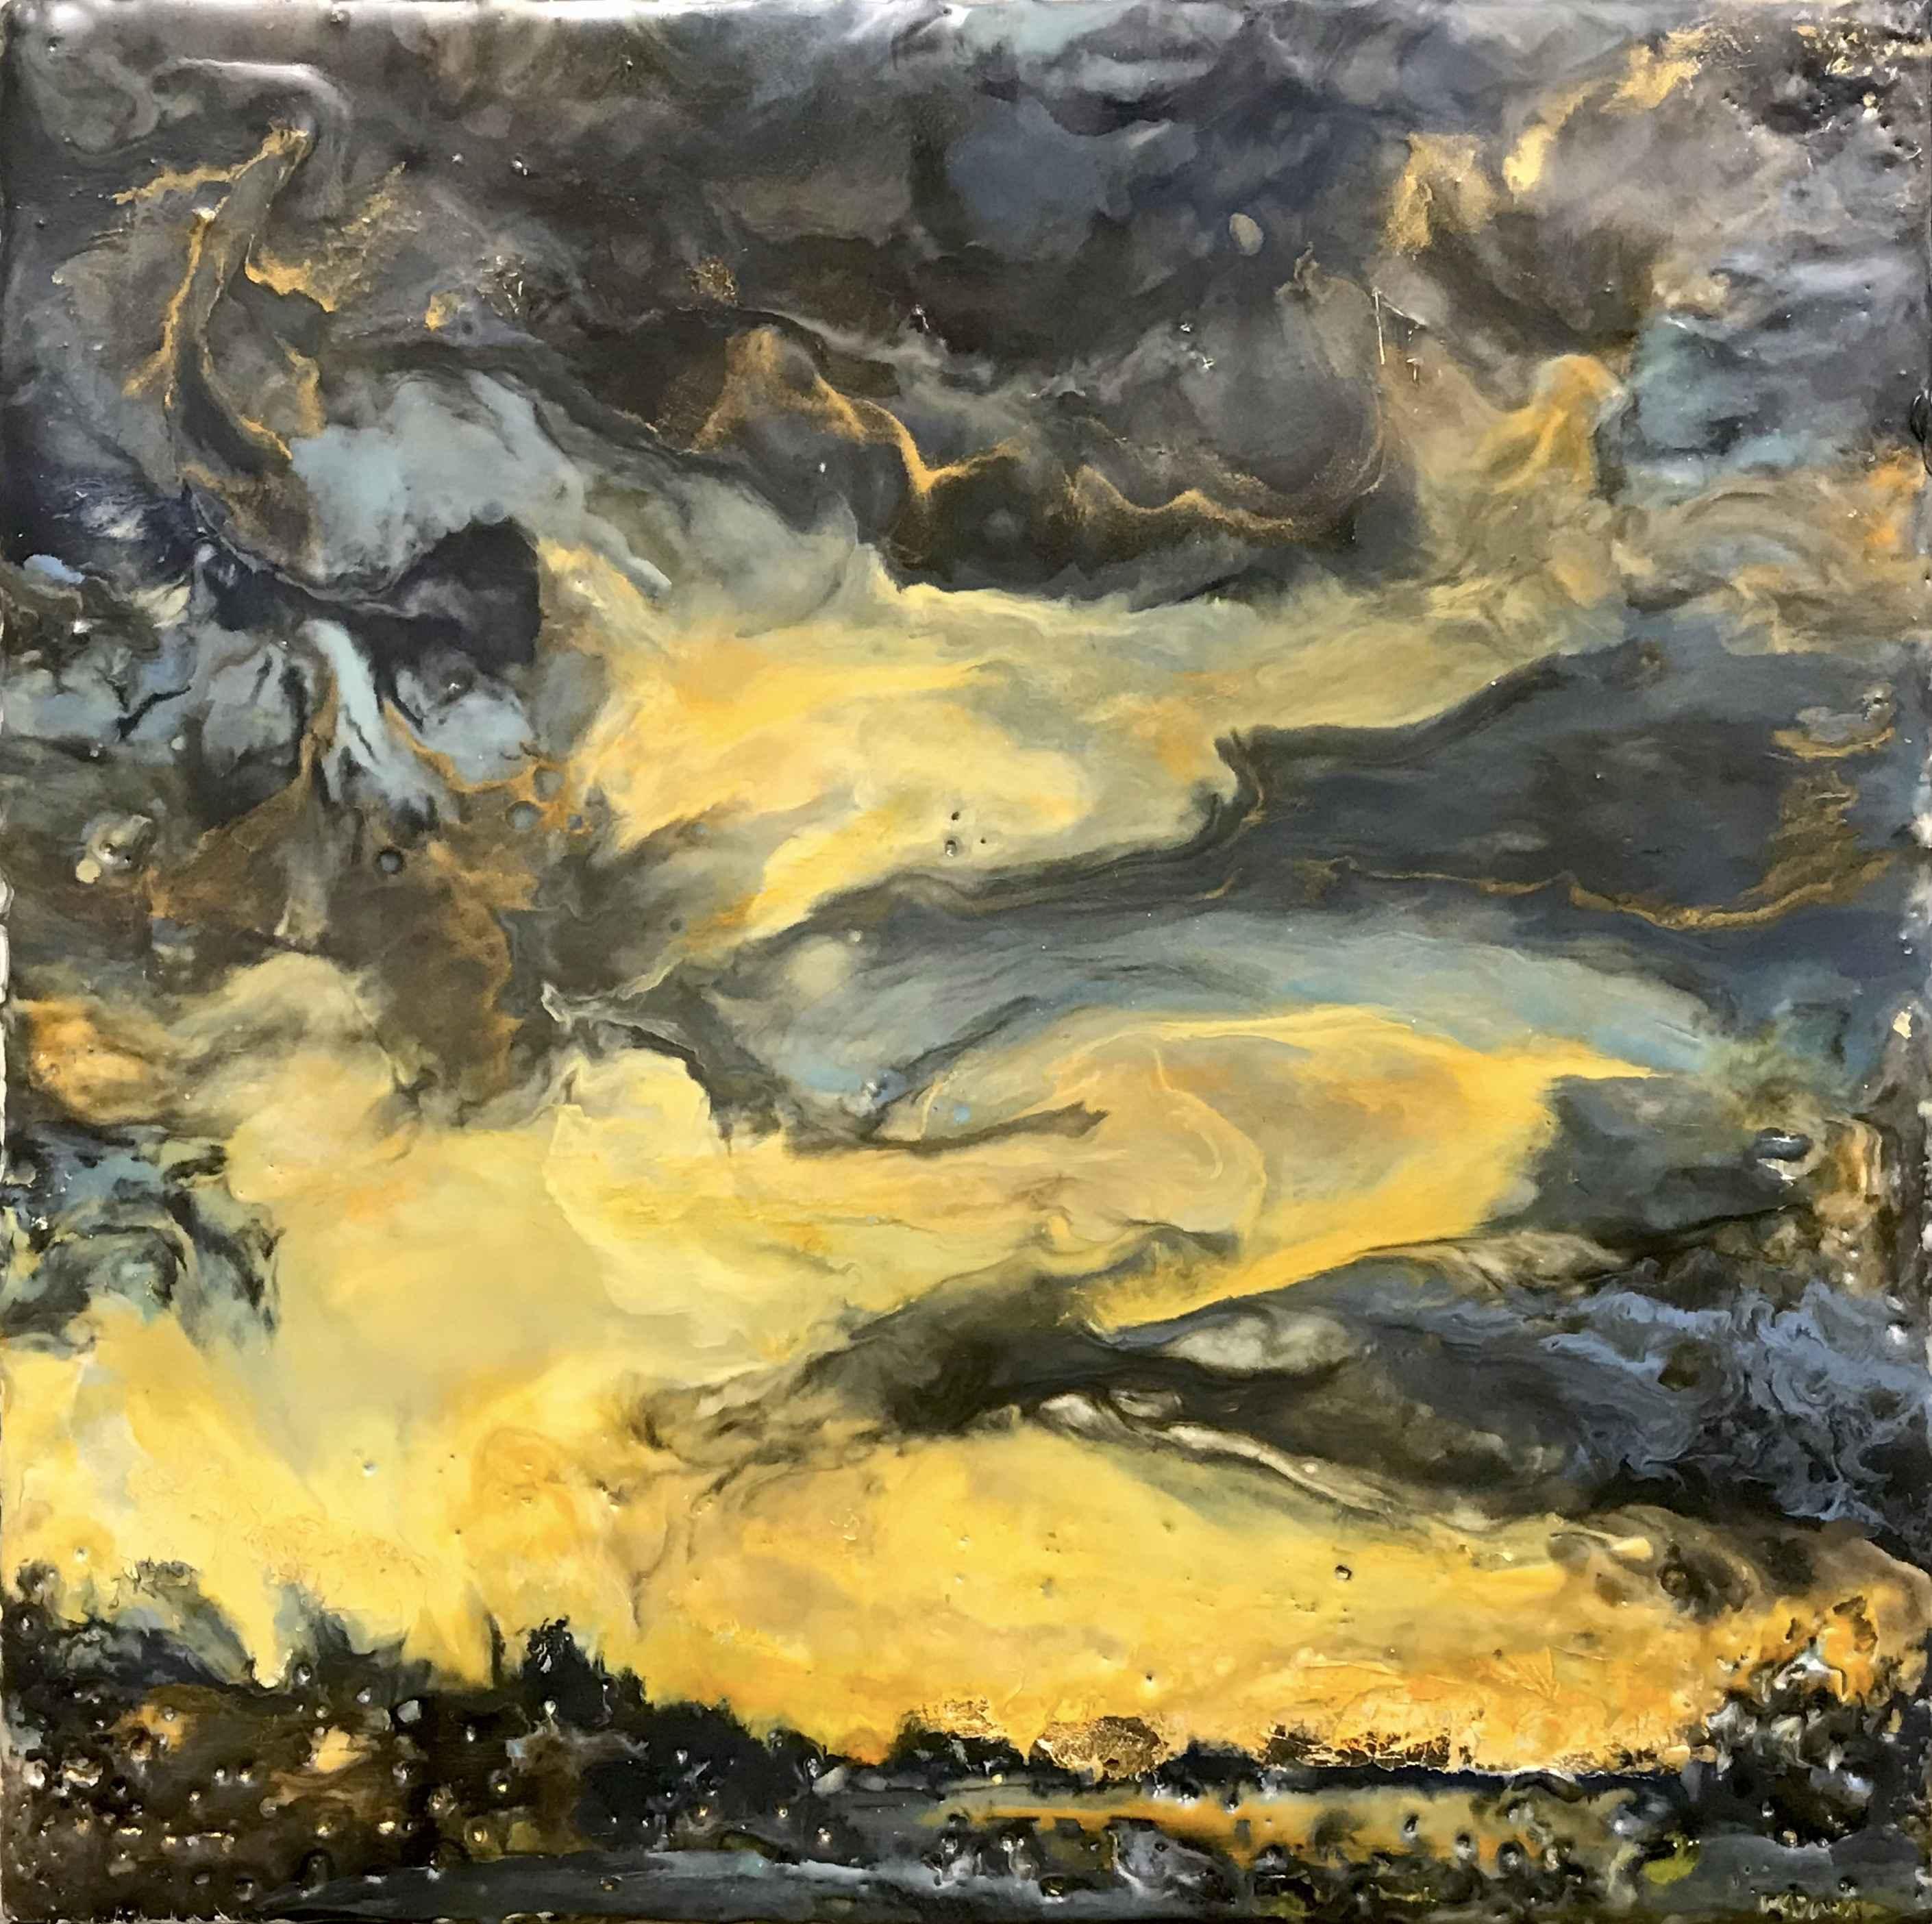 Golden kiss by  Kathy Bradshaw - Masterpiece Online